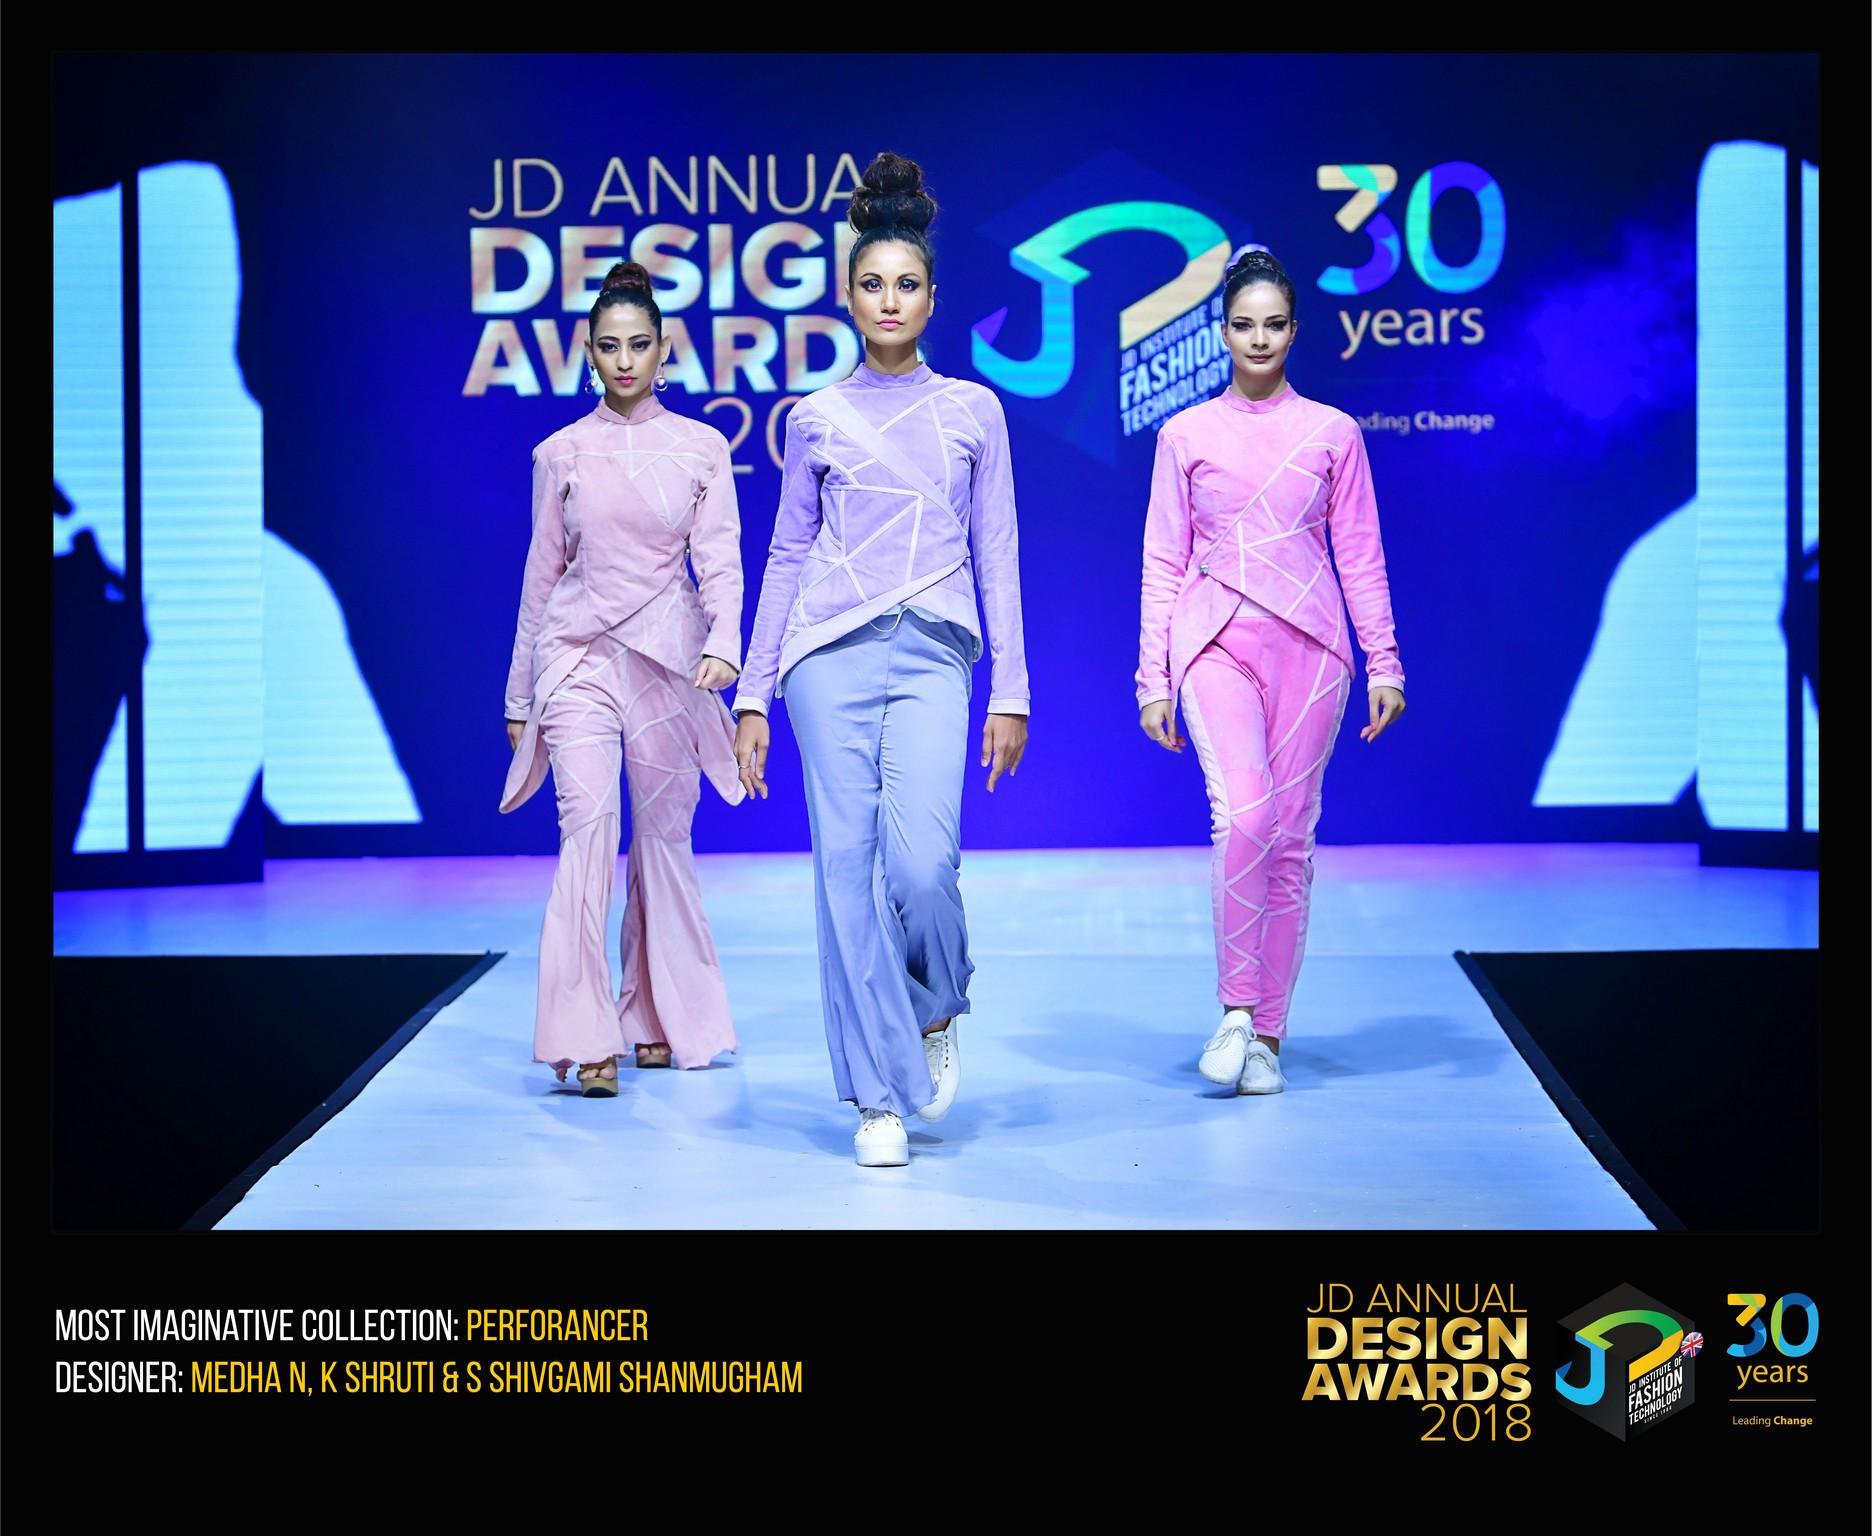 Perforancer – Change – JD Annual Design Awards 2018   Designer: Sohinee, Ravina and Varsha   Photography : Jerin Nath (@jerin_nath) perforancer - PERFORANCER8 - Perforancer – Change – JD Annual Design Awards 2018